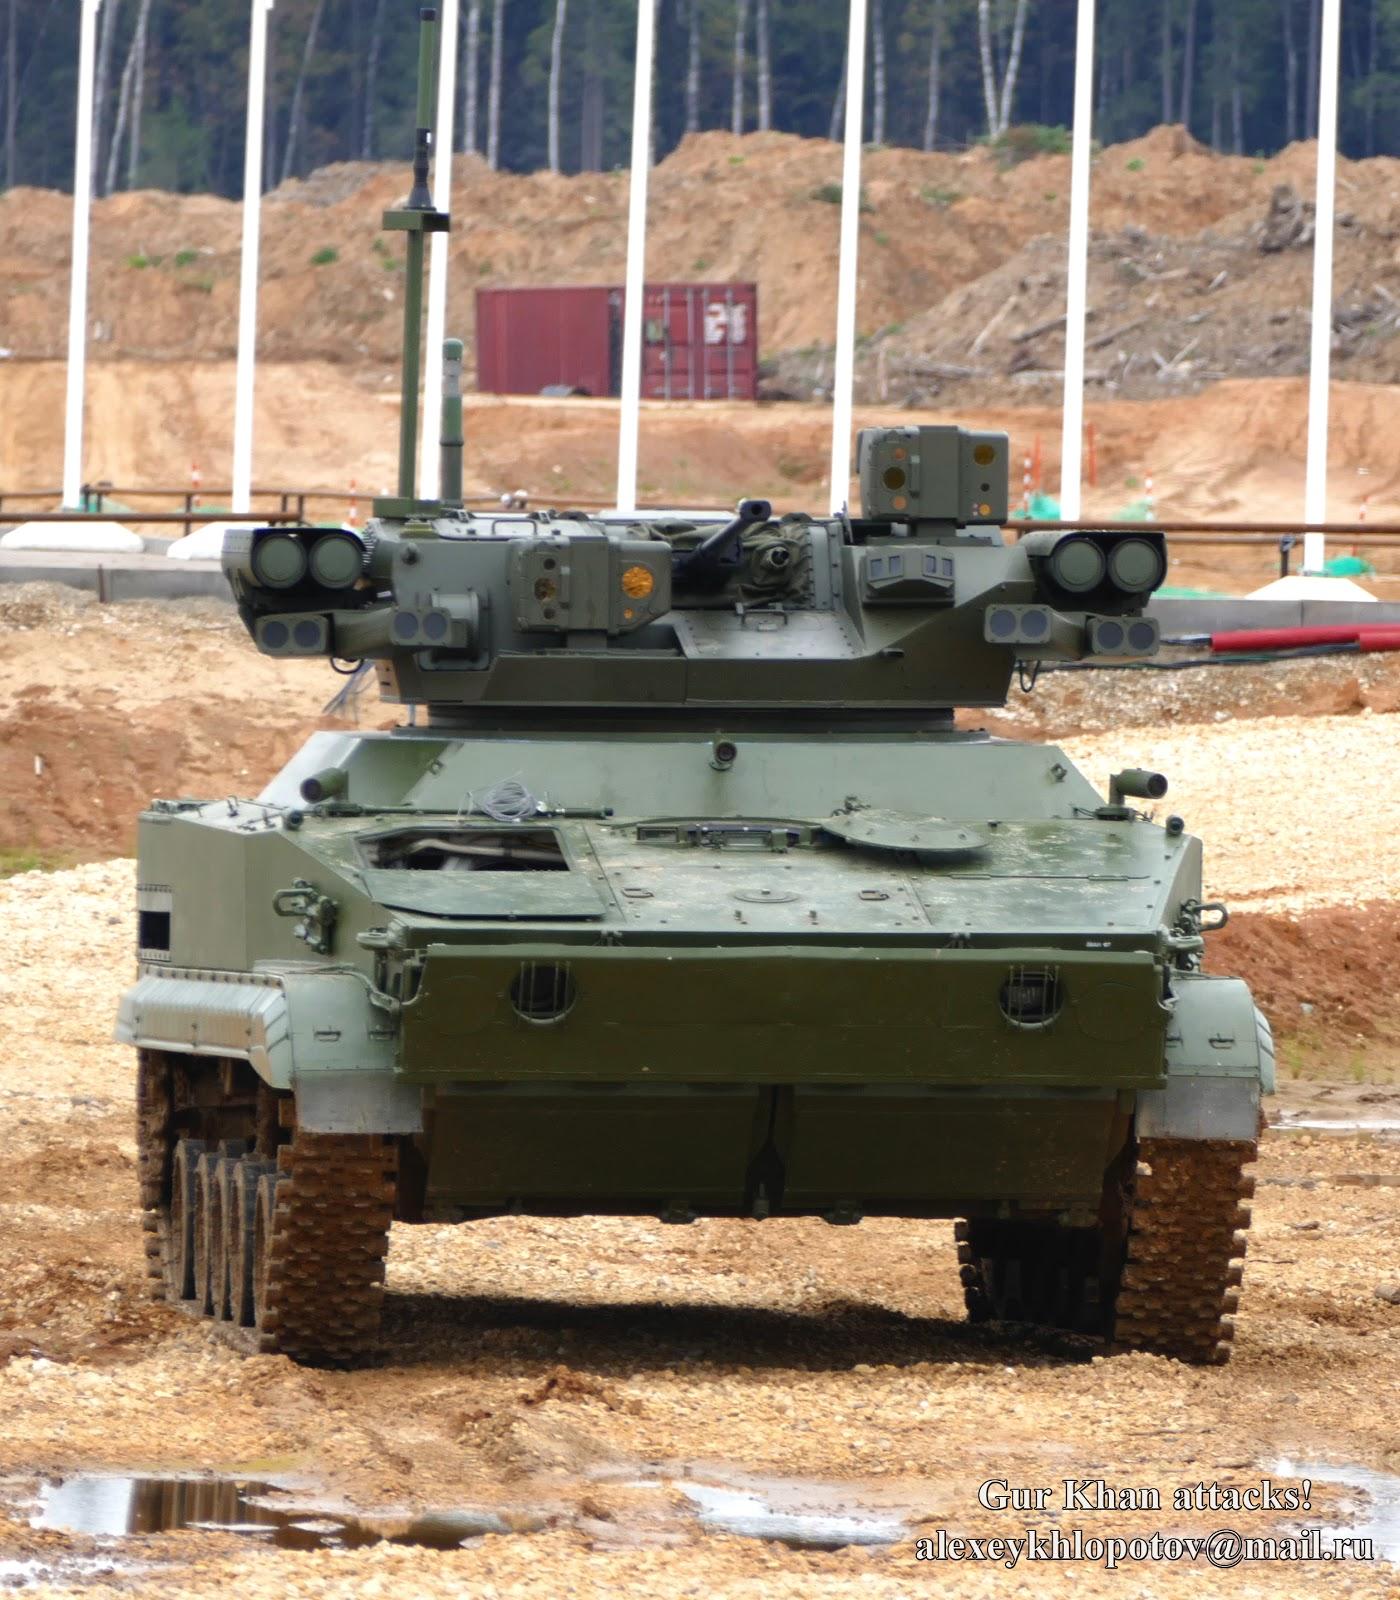 Russian Army Robots - Page 5 2430701_original